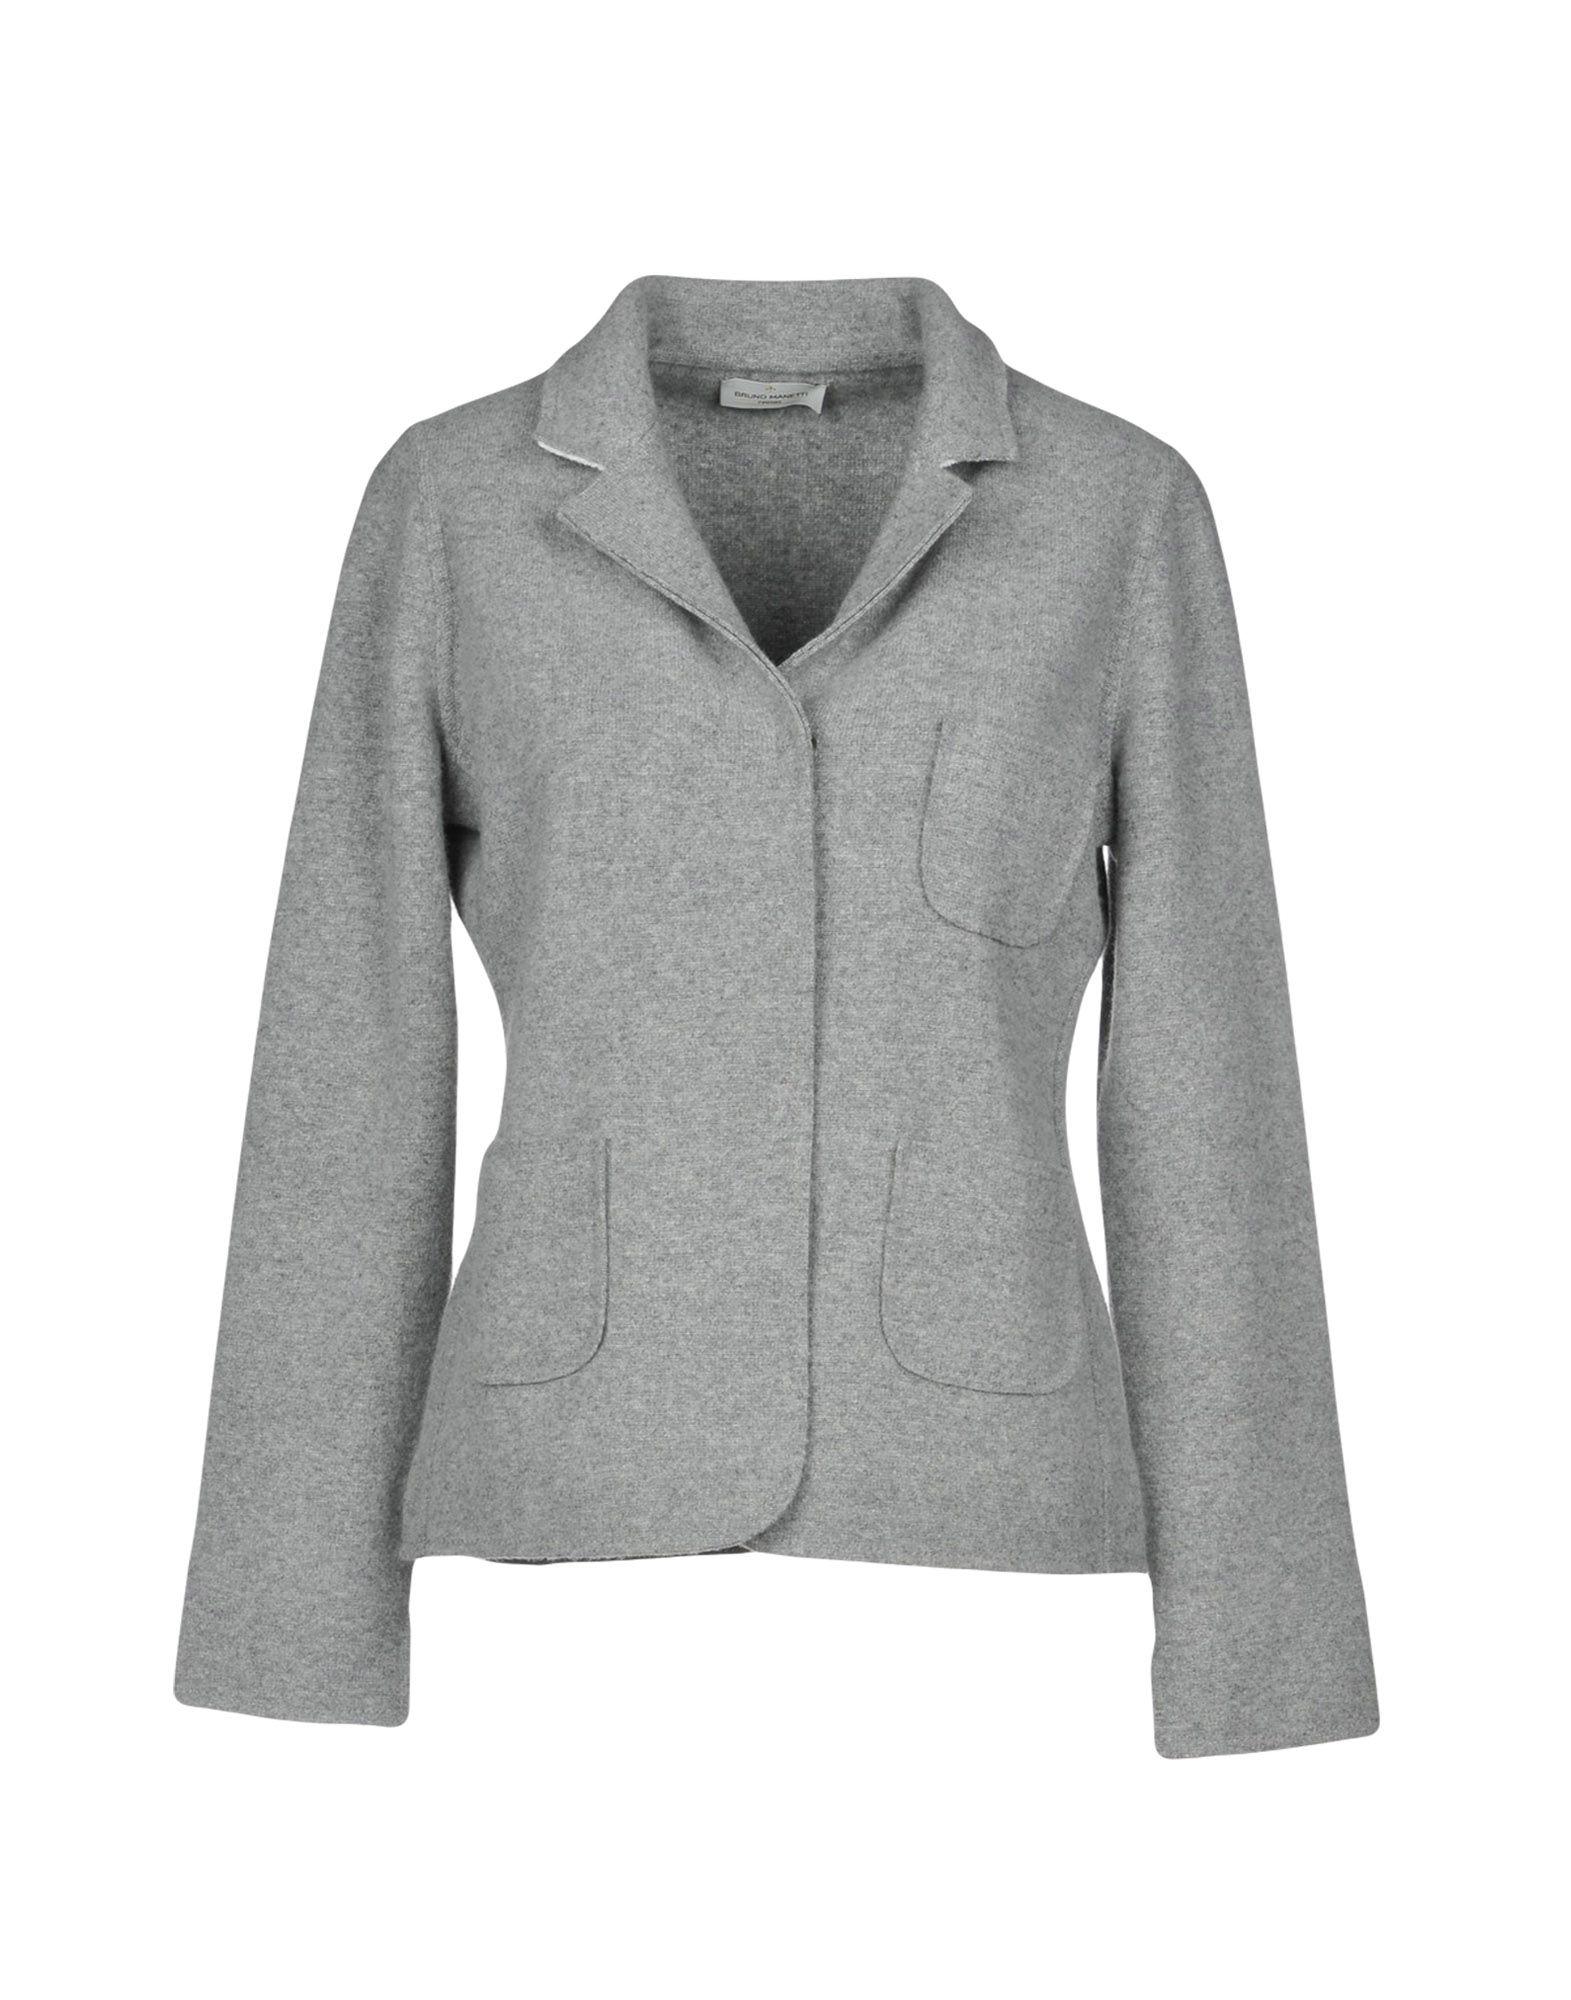 BRUNO MANETTI Blazer in Light Grey